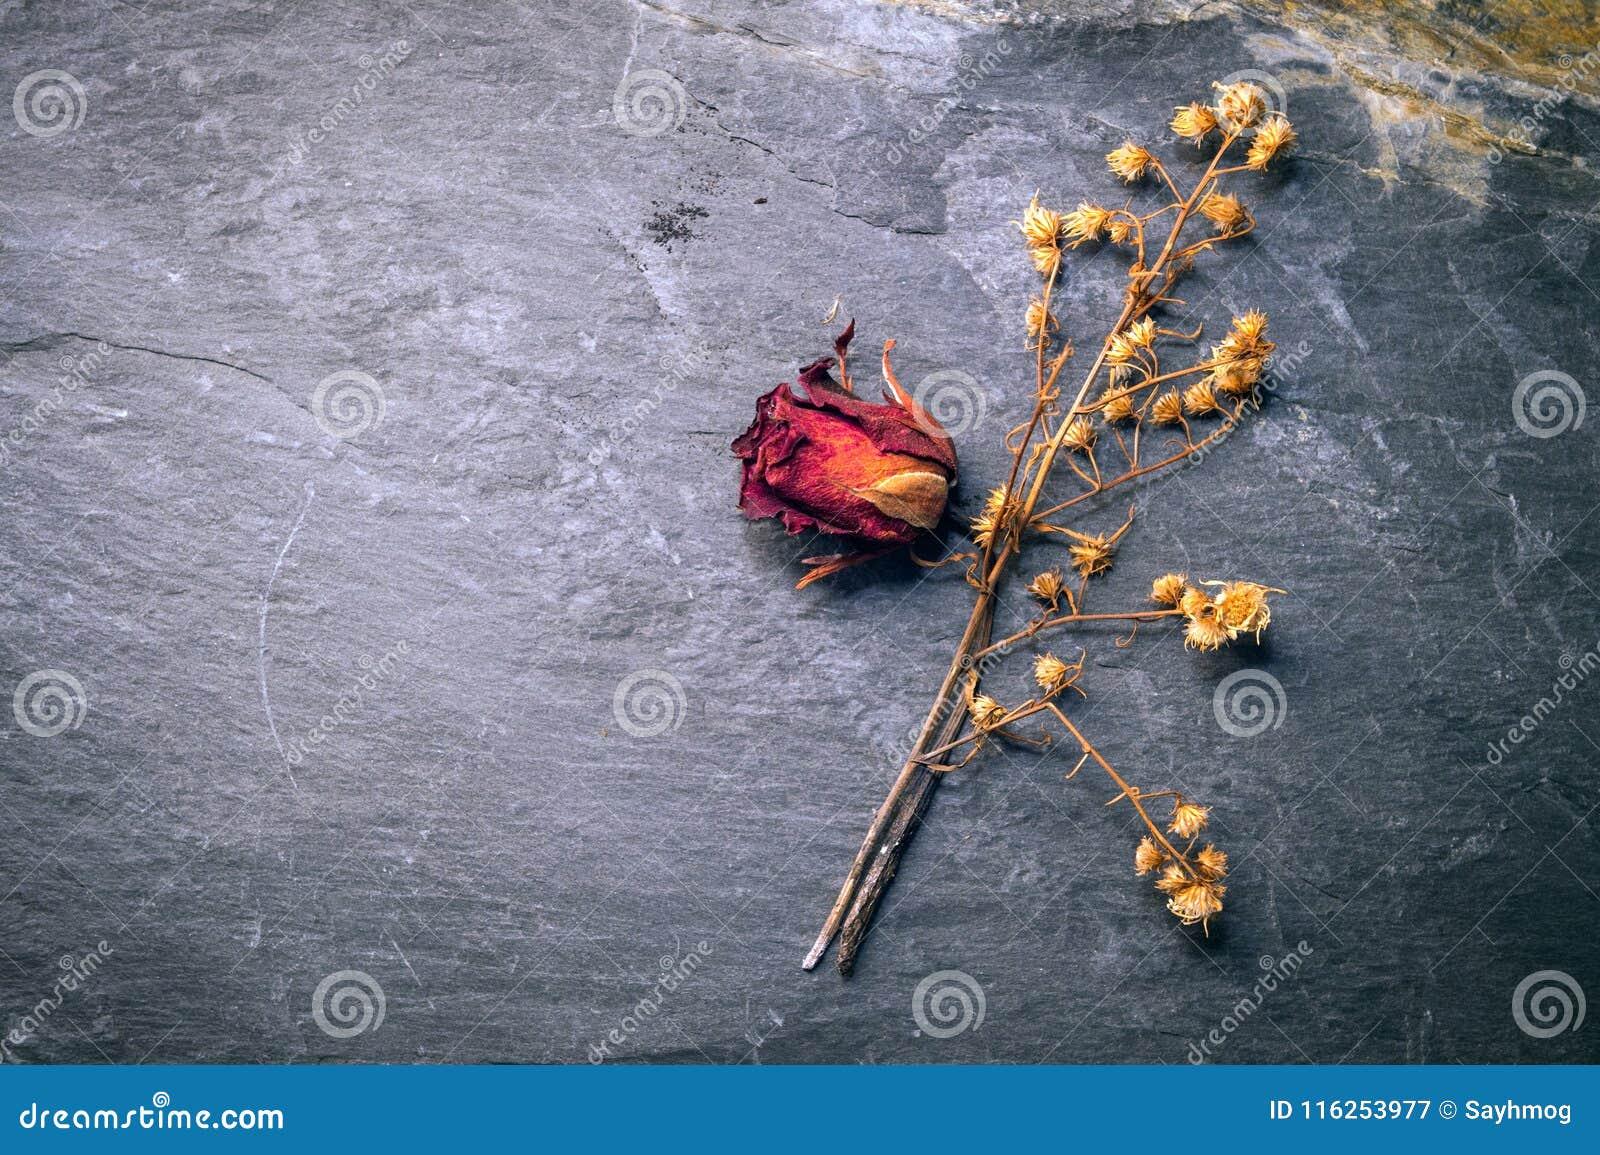 Dry Rose Flower on Stone